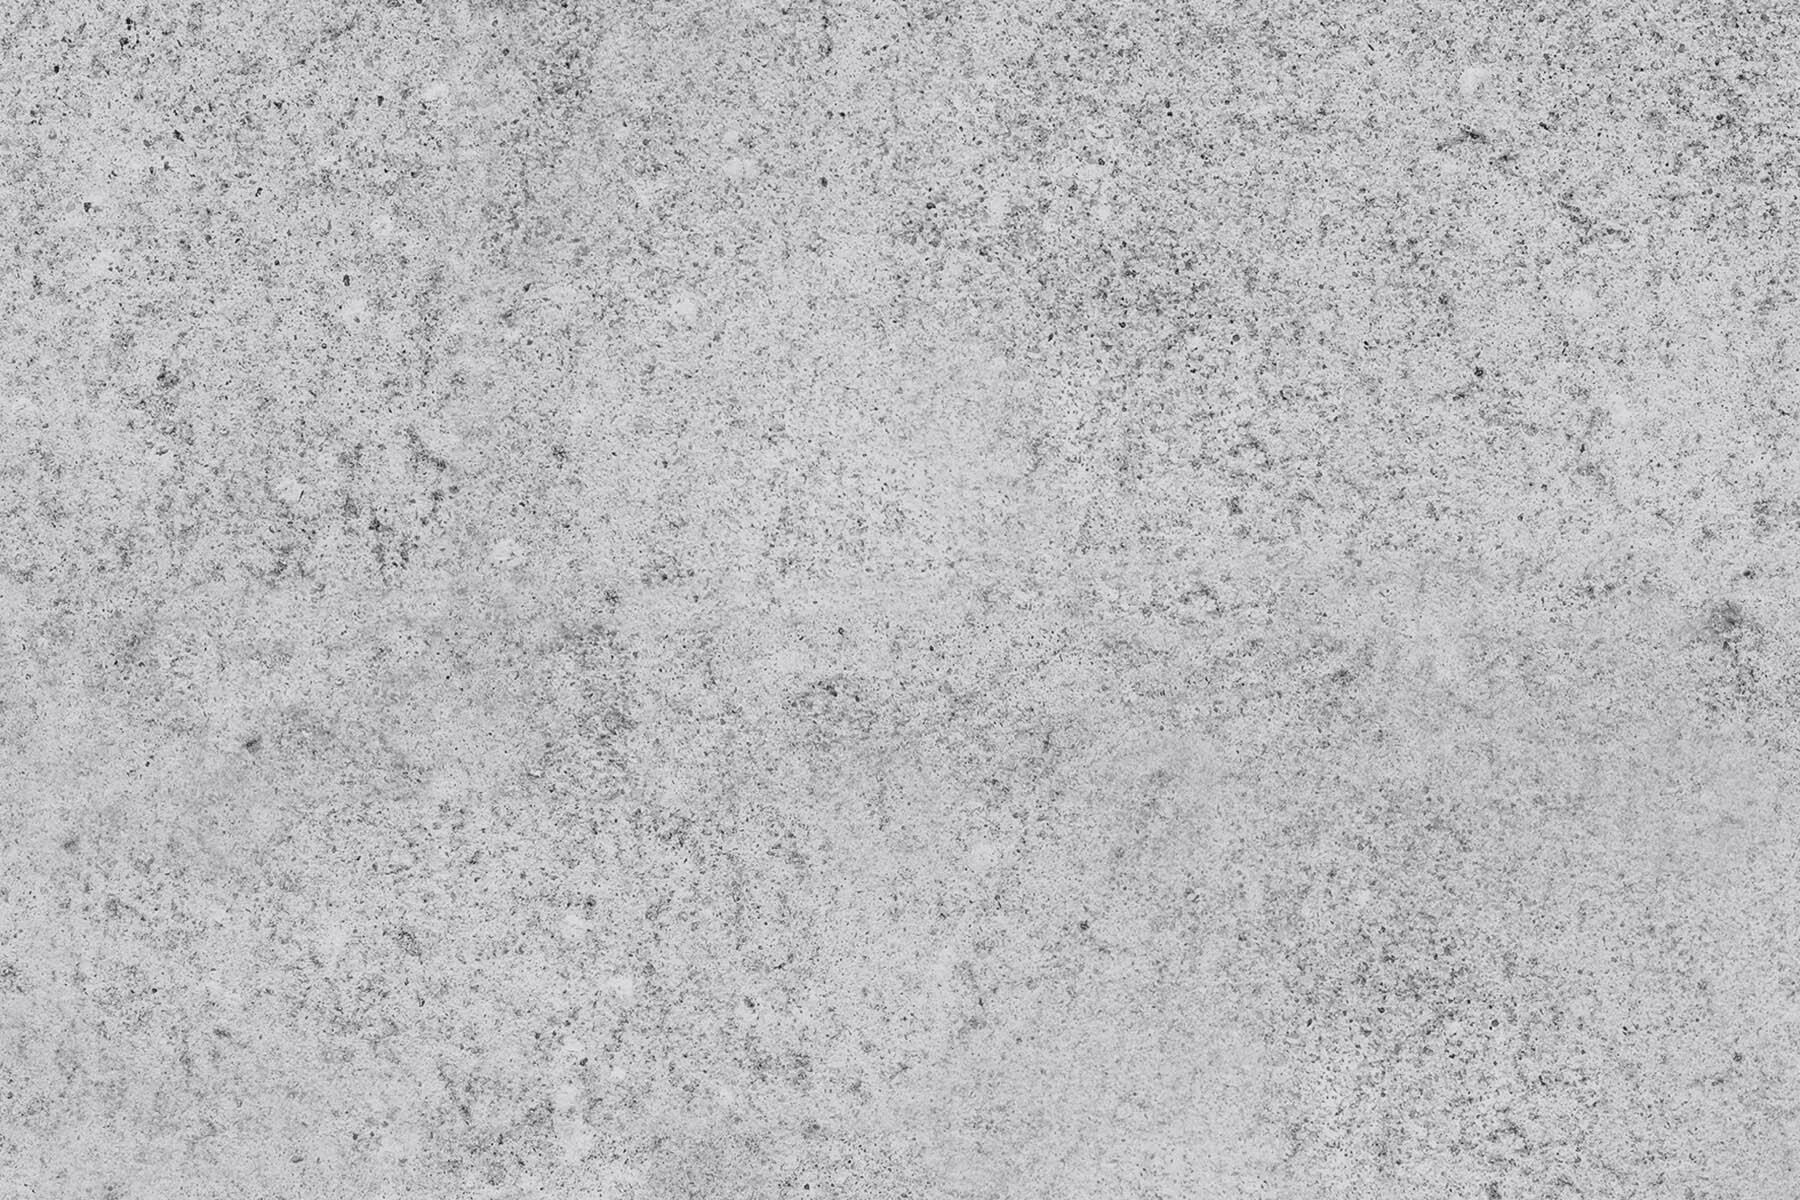 PlateART Duschrückwand mit Motiv Steinwand Grau